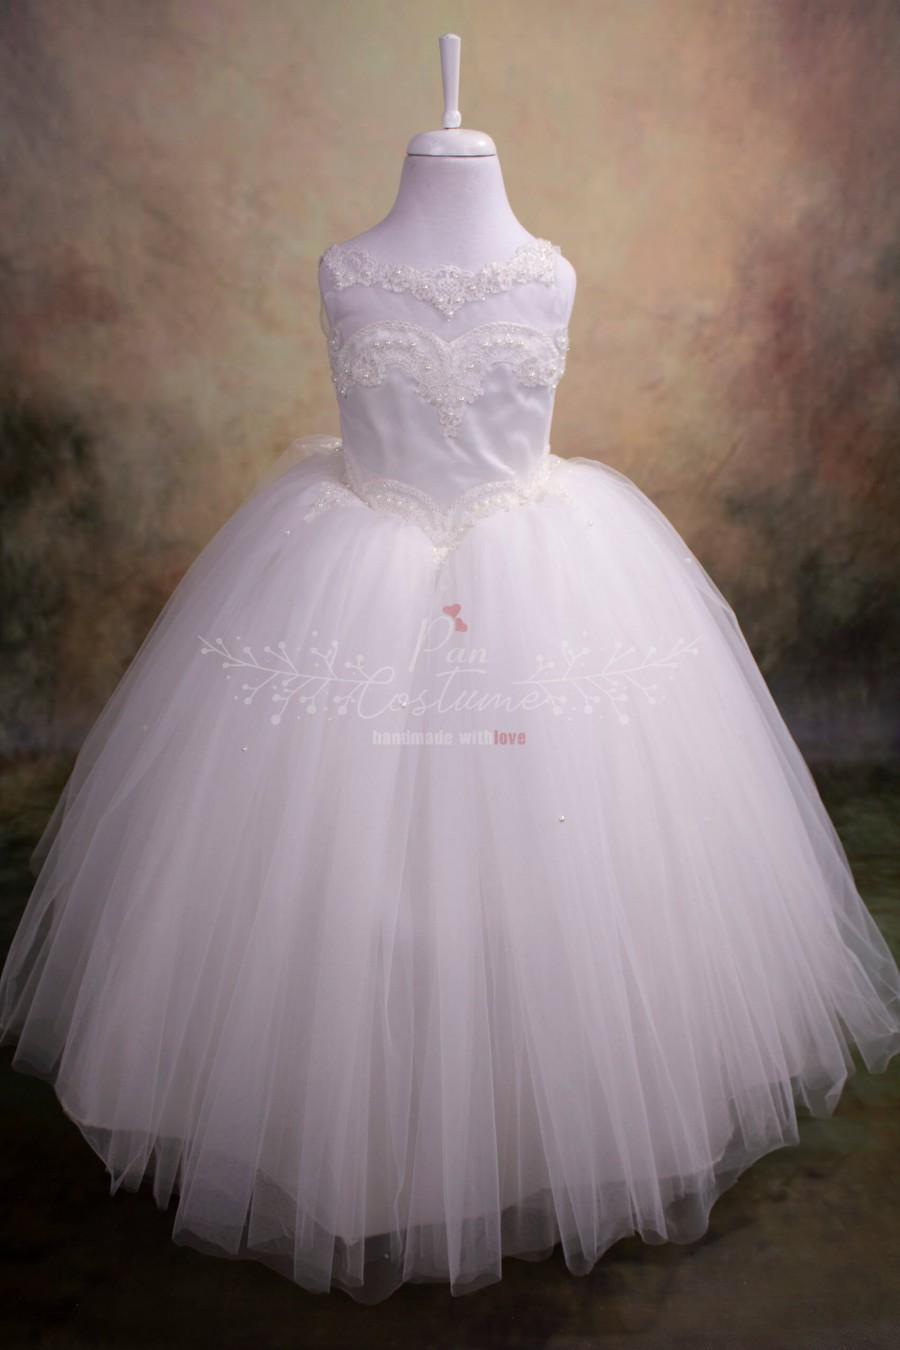 Wedding - White Flower Girl Dress, First Communion Dress, Guipure Neckline Party Gown